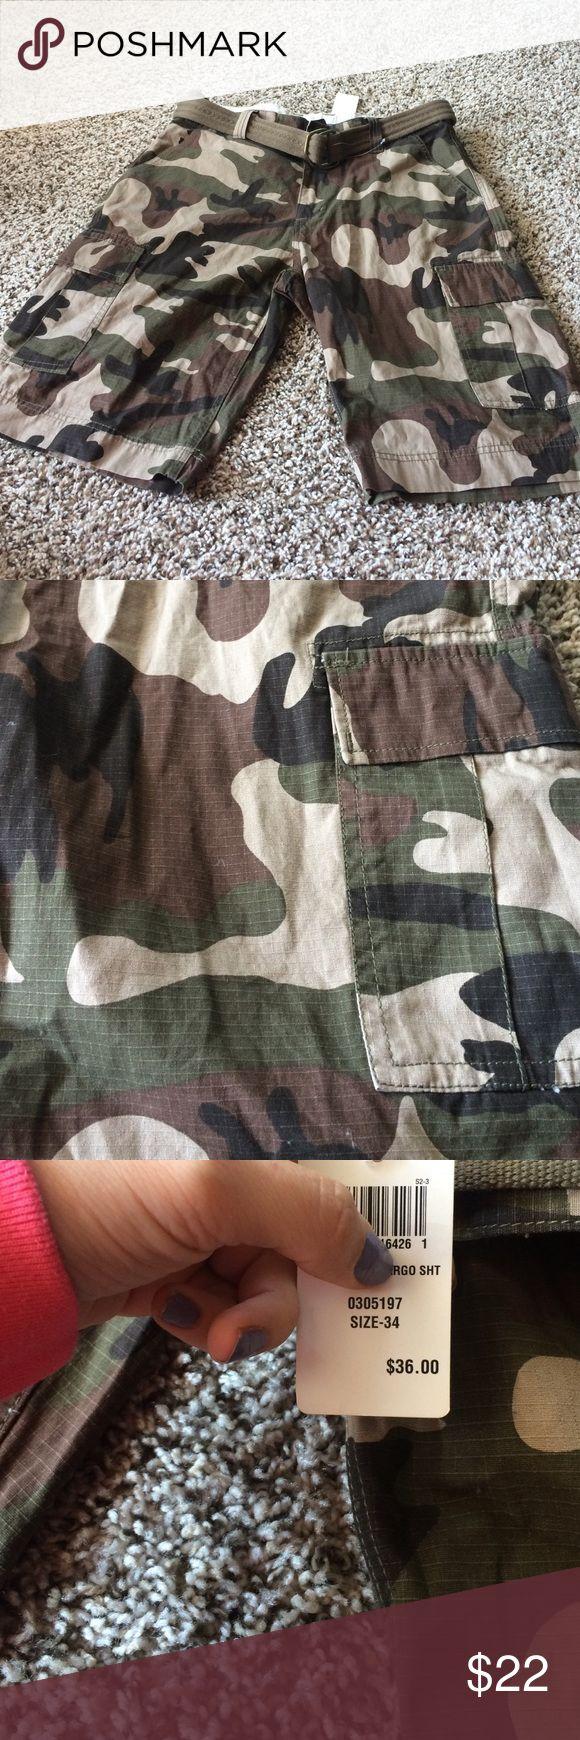 NWT cammo cargo shorts! size 34 Brand new never worn from footlocker. Size 34! Shorts Cargo